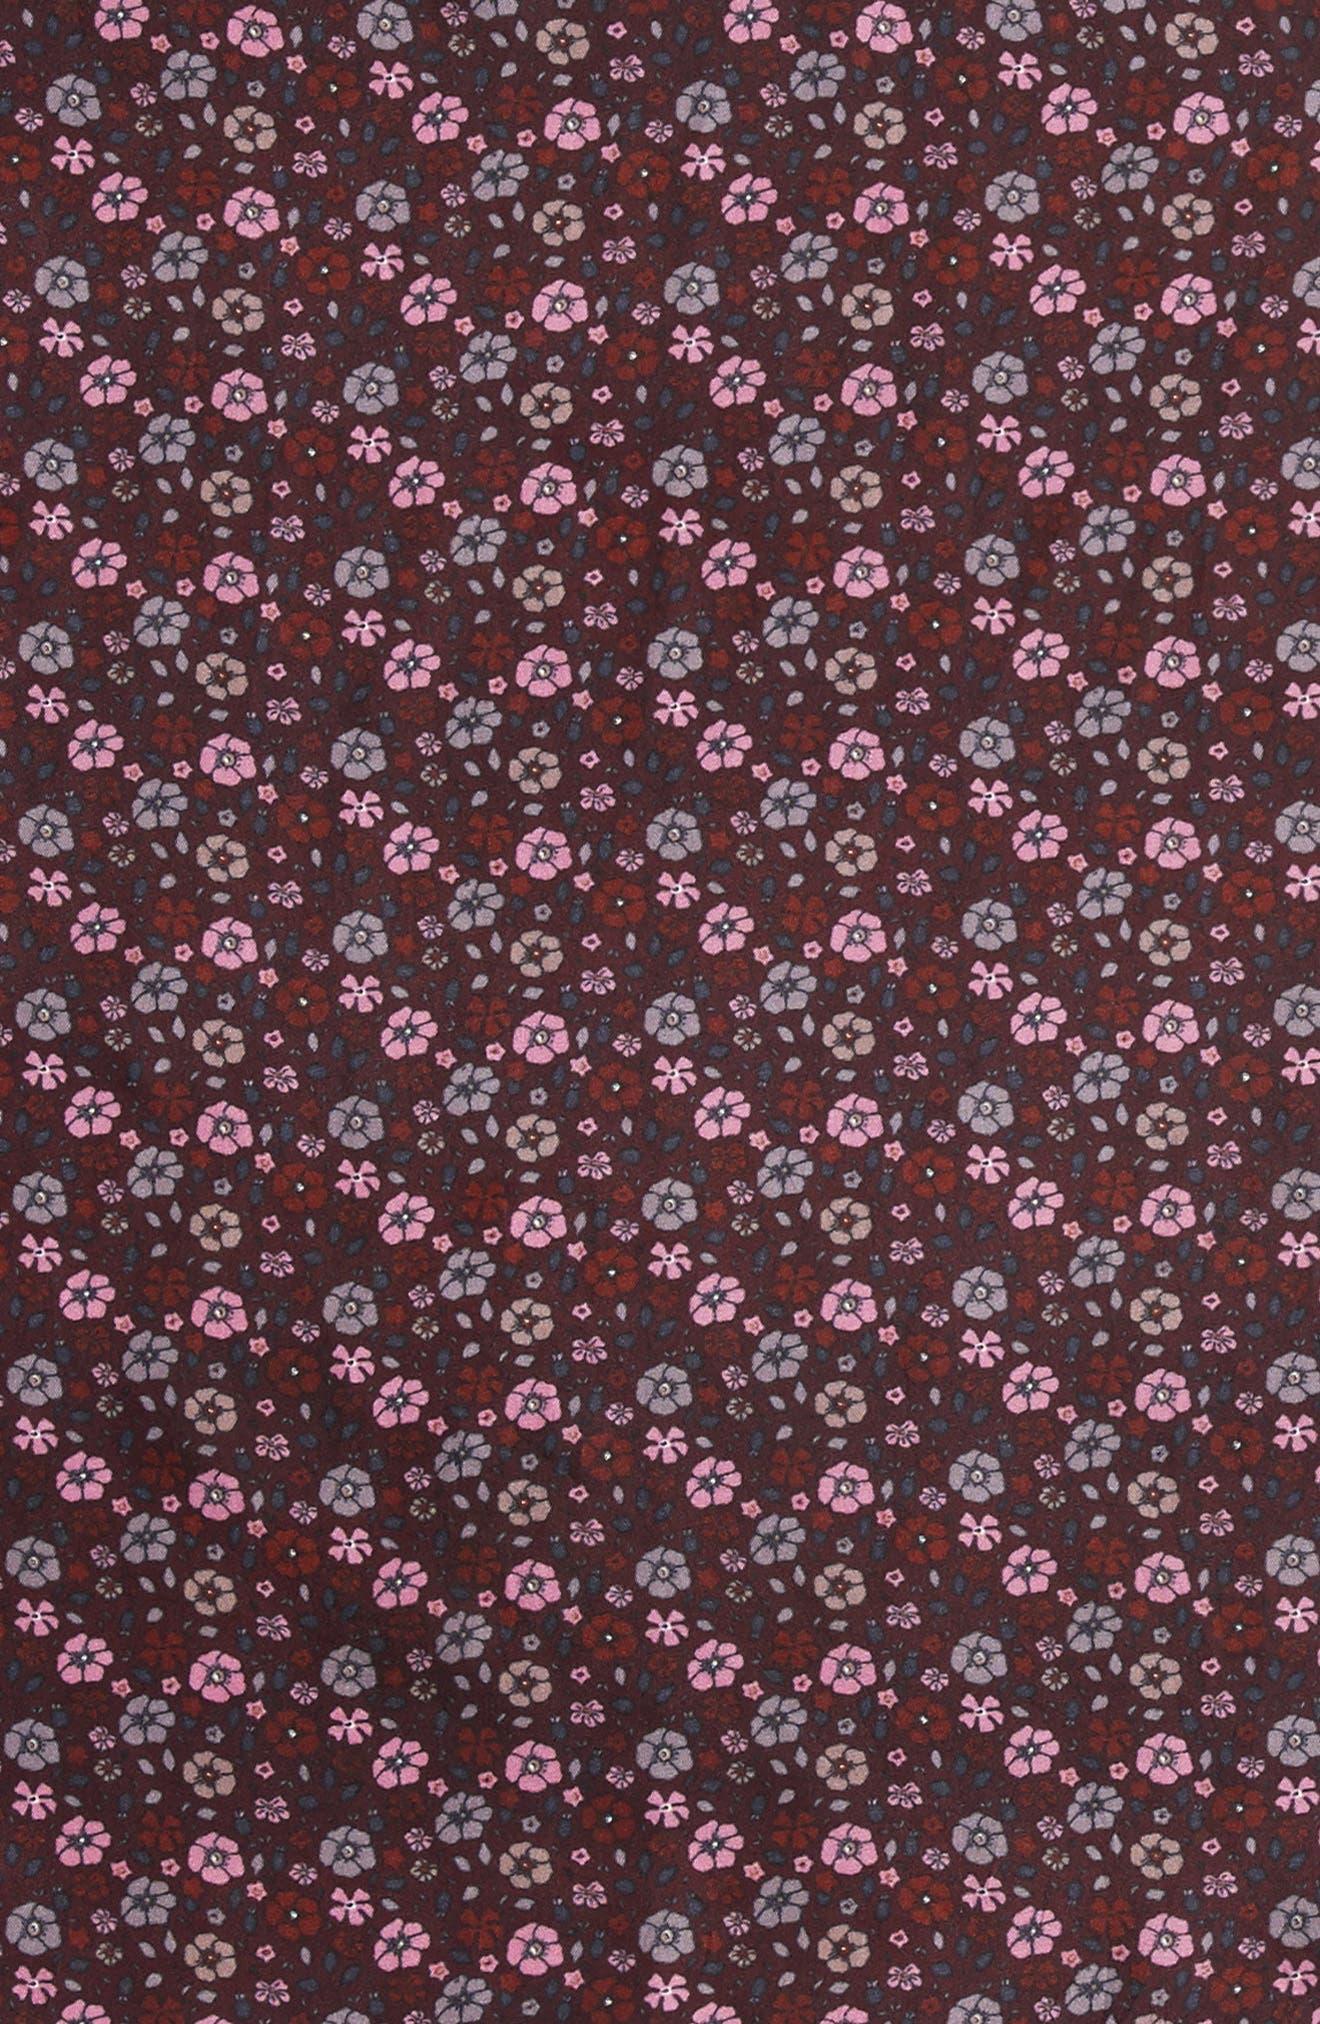 Floral Silk Bandana,                             Alternate thumbnail 4, color,                             Maroon Multi